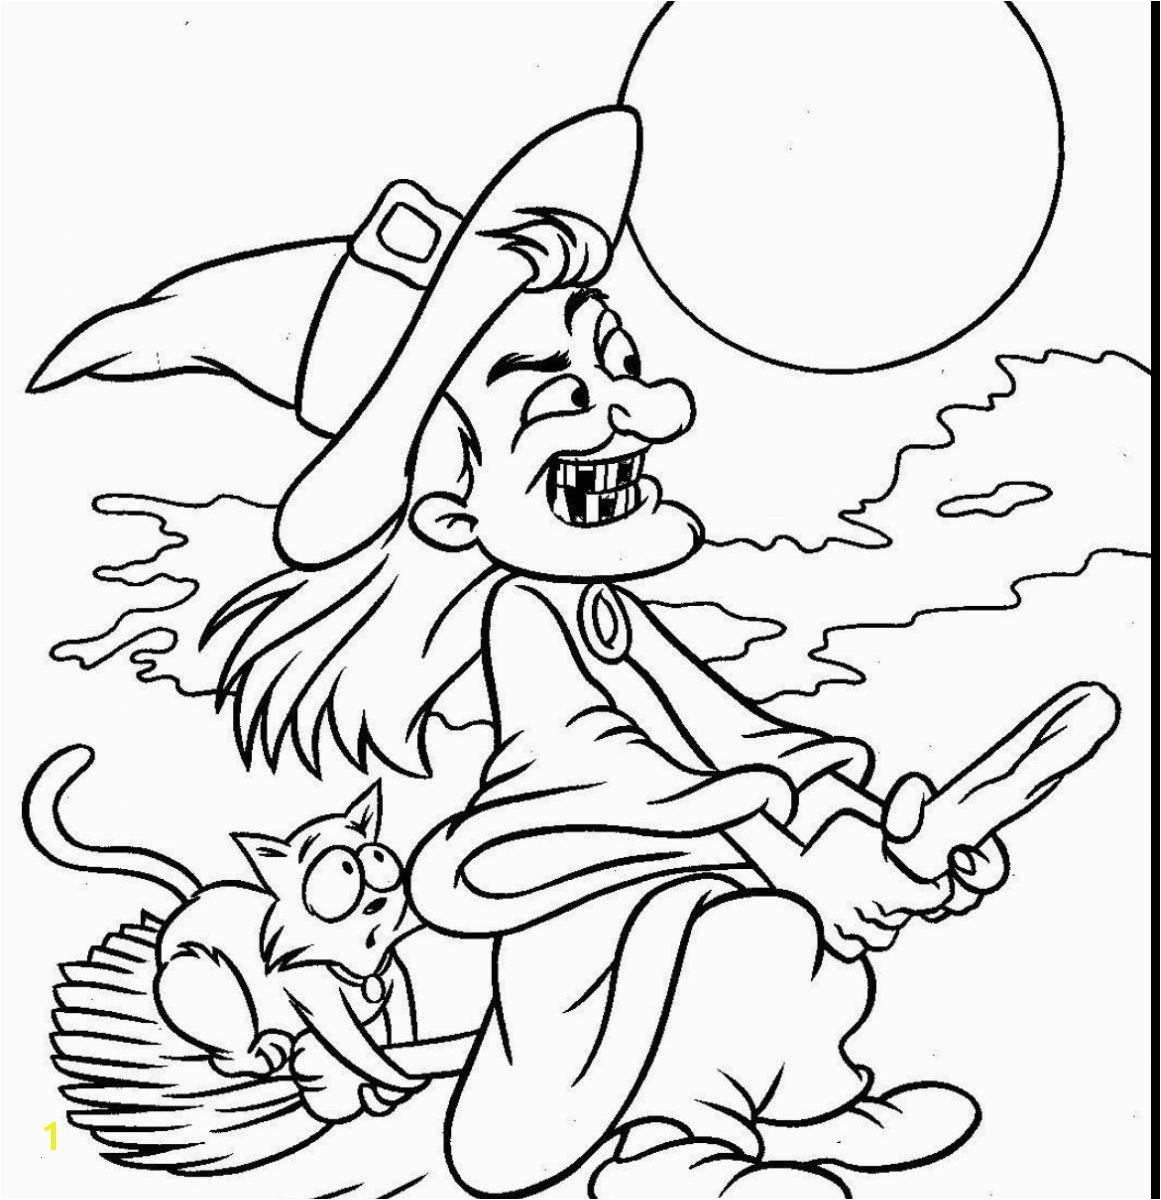 Ausmalbilder Halloween Vampir Schön Barney Halloween Coloring Pages New Berühmt Barney Halloween Best